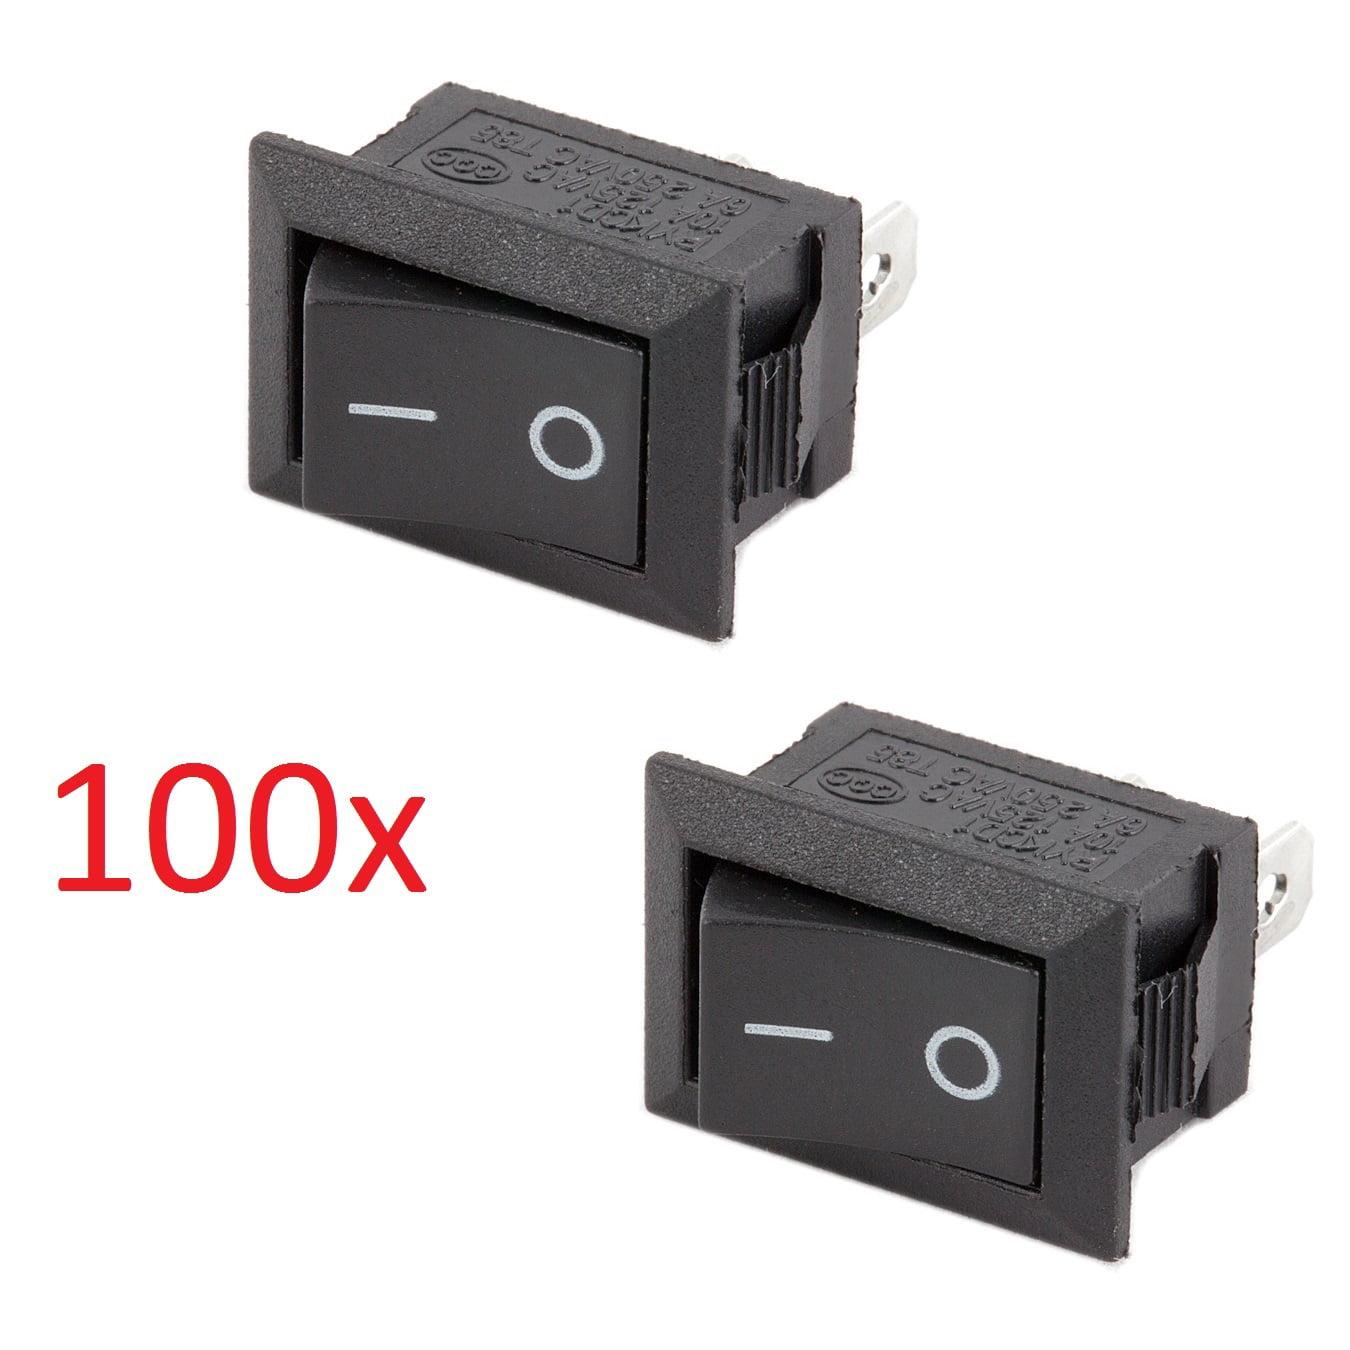 100x SPST On/Off Black Square I/O Rocker Mini 12V Switch for Automotive/Car/Boat